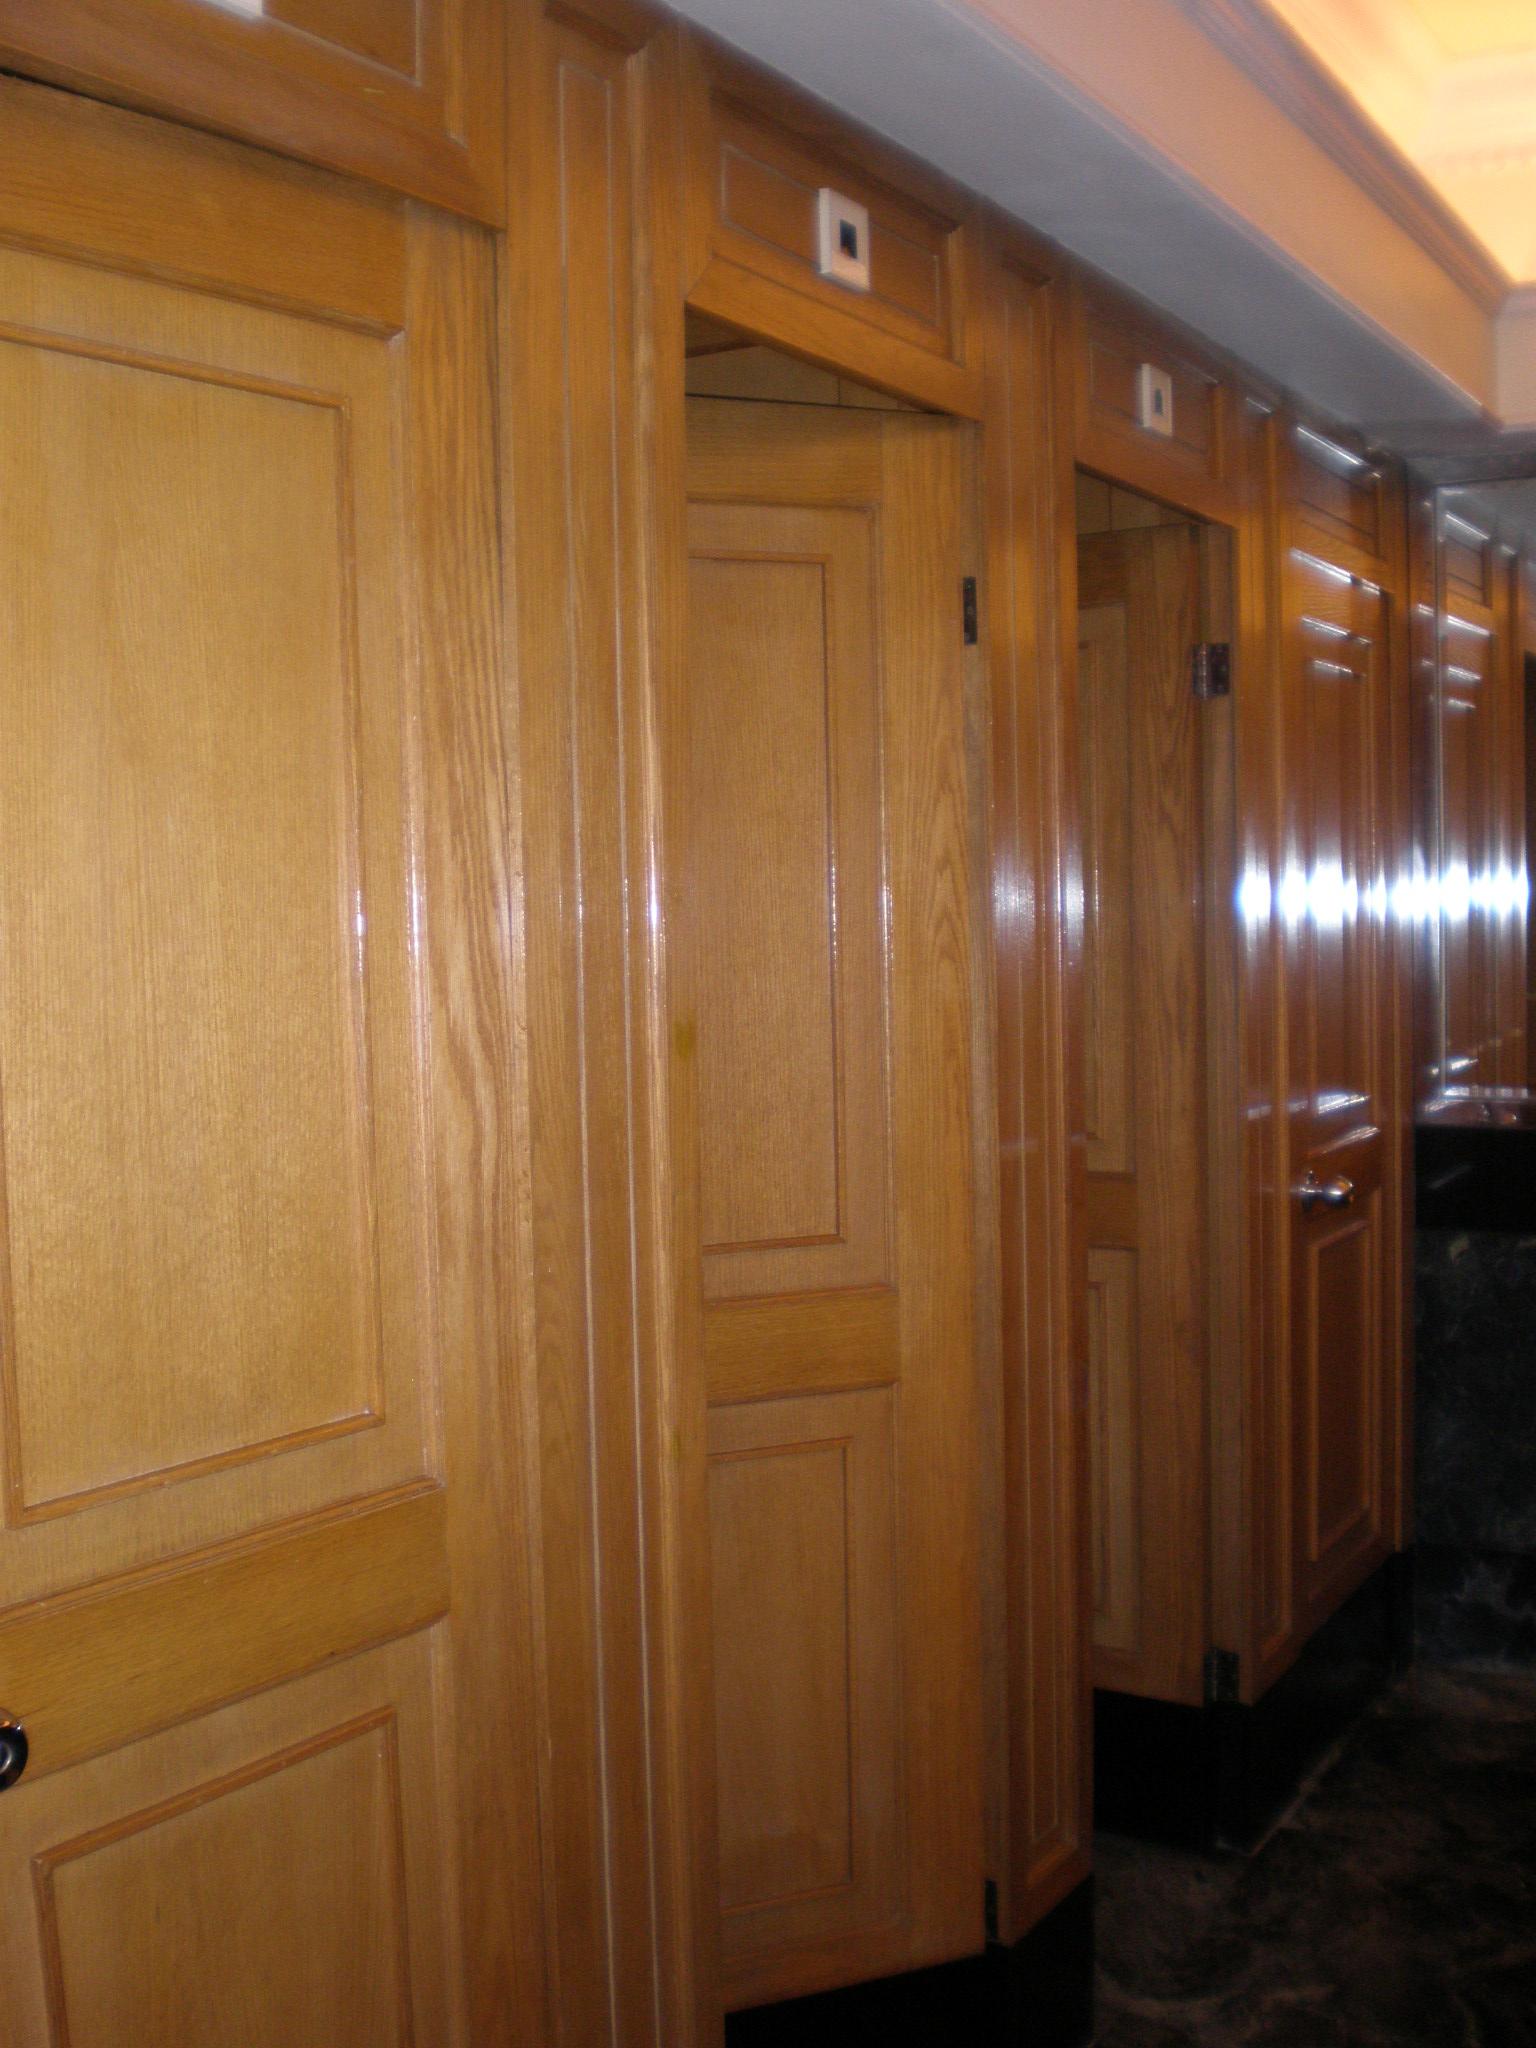 Bathroom Stalls England file:the peninsula hk men's restroom toilet stalls - wikimedia